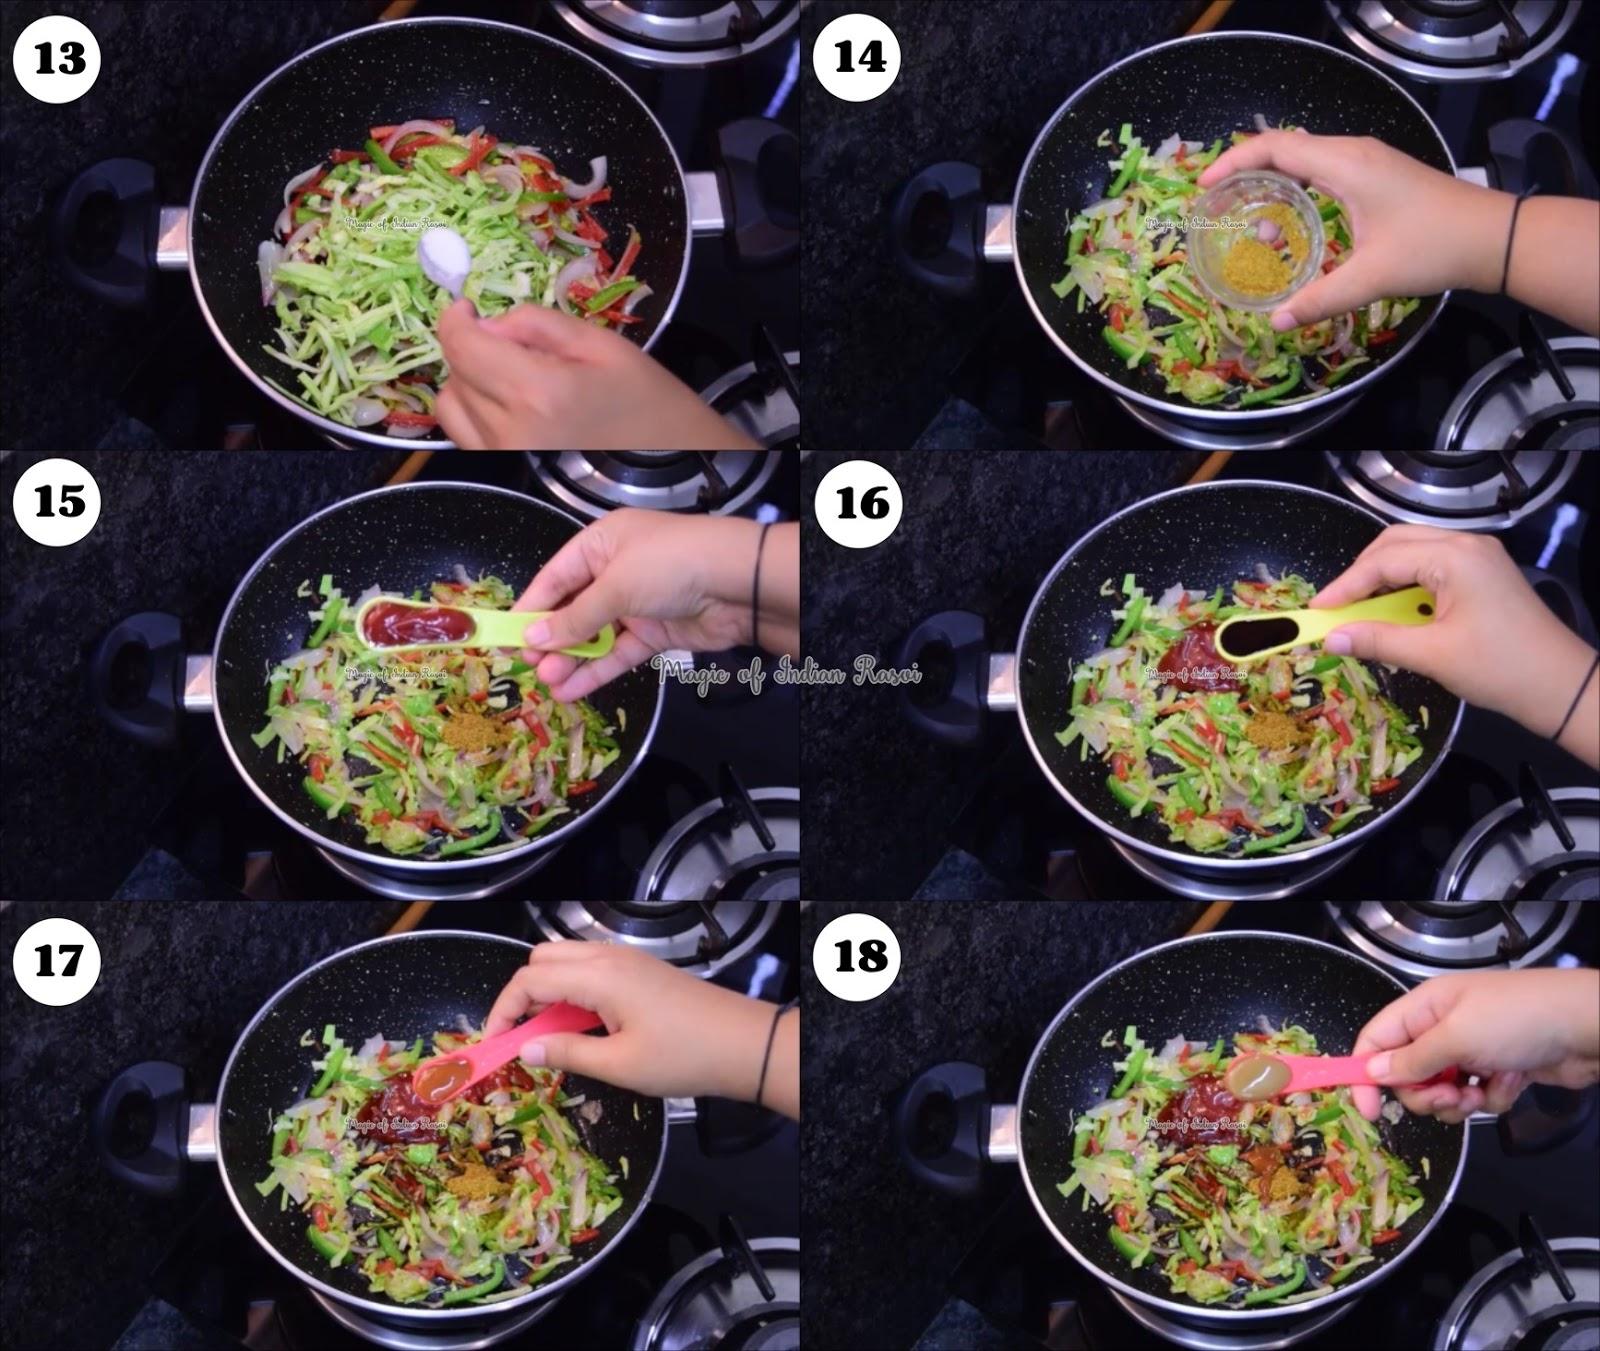 Noodles Dosa - Spring Dosa - Chinese Dosa - Easy Party Starter Recipe - नूडल्स डोसा - स्प्रिंग डोसा - चिनेसे डोसा - इजी पार्टी स्टार्टर रेसिपी - Priya R - Magic of Indian Rasoi